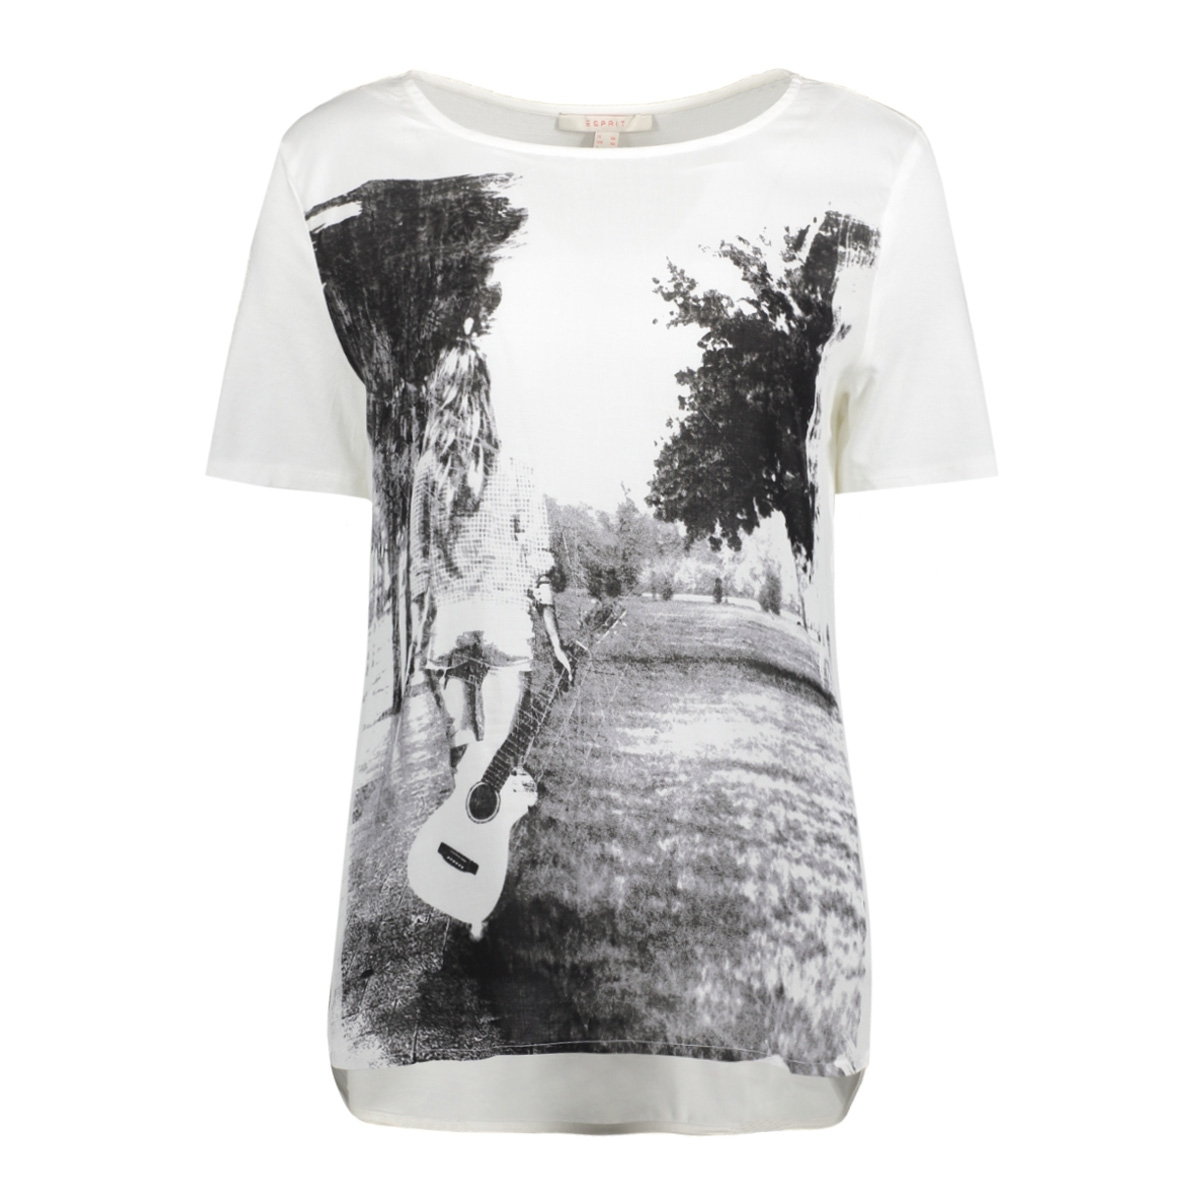 077ee1f017 esprit t-shirt e110